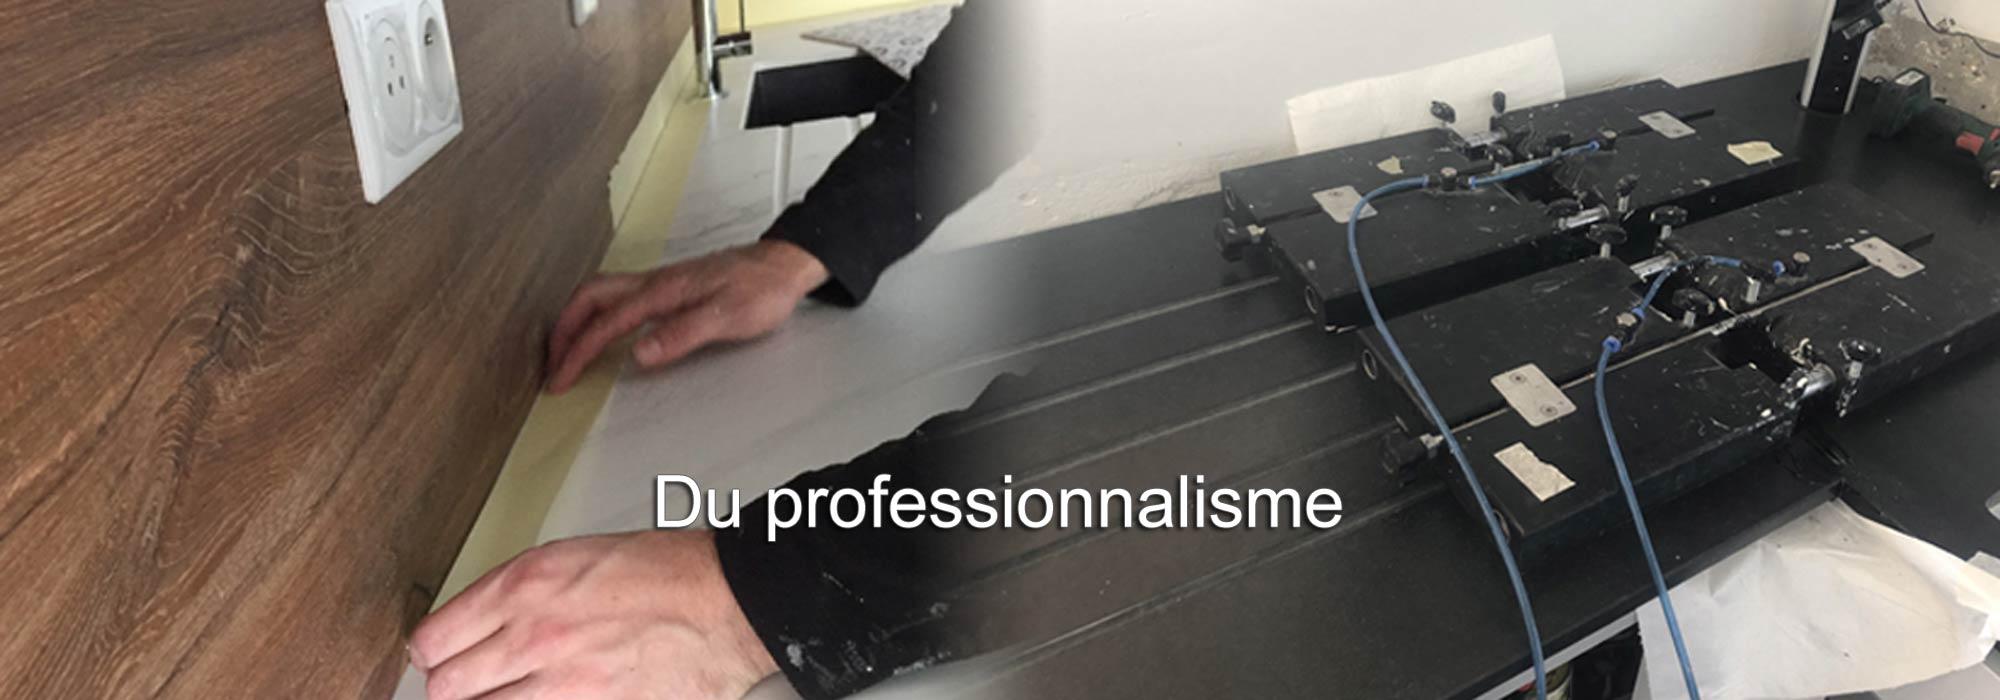 Du professionnalisme